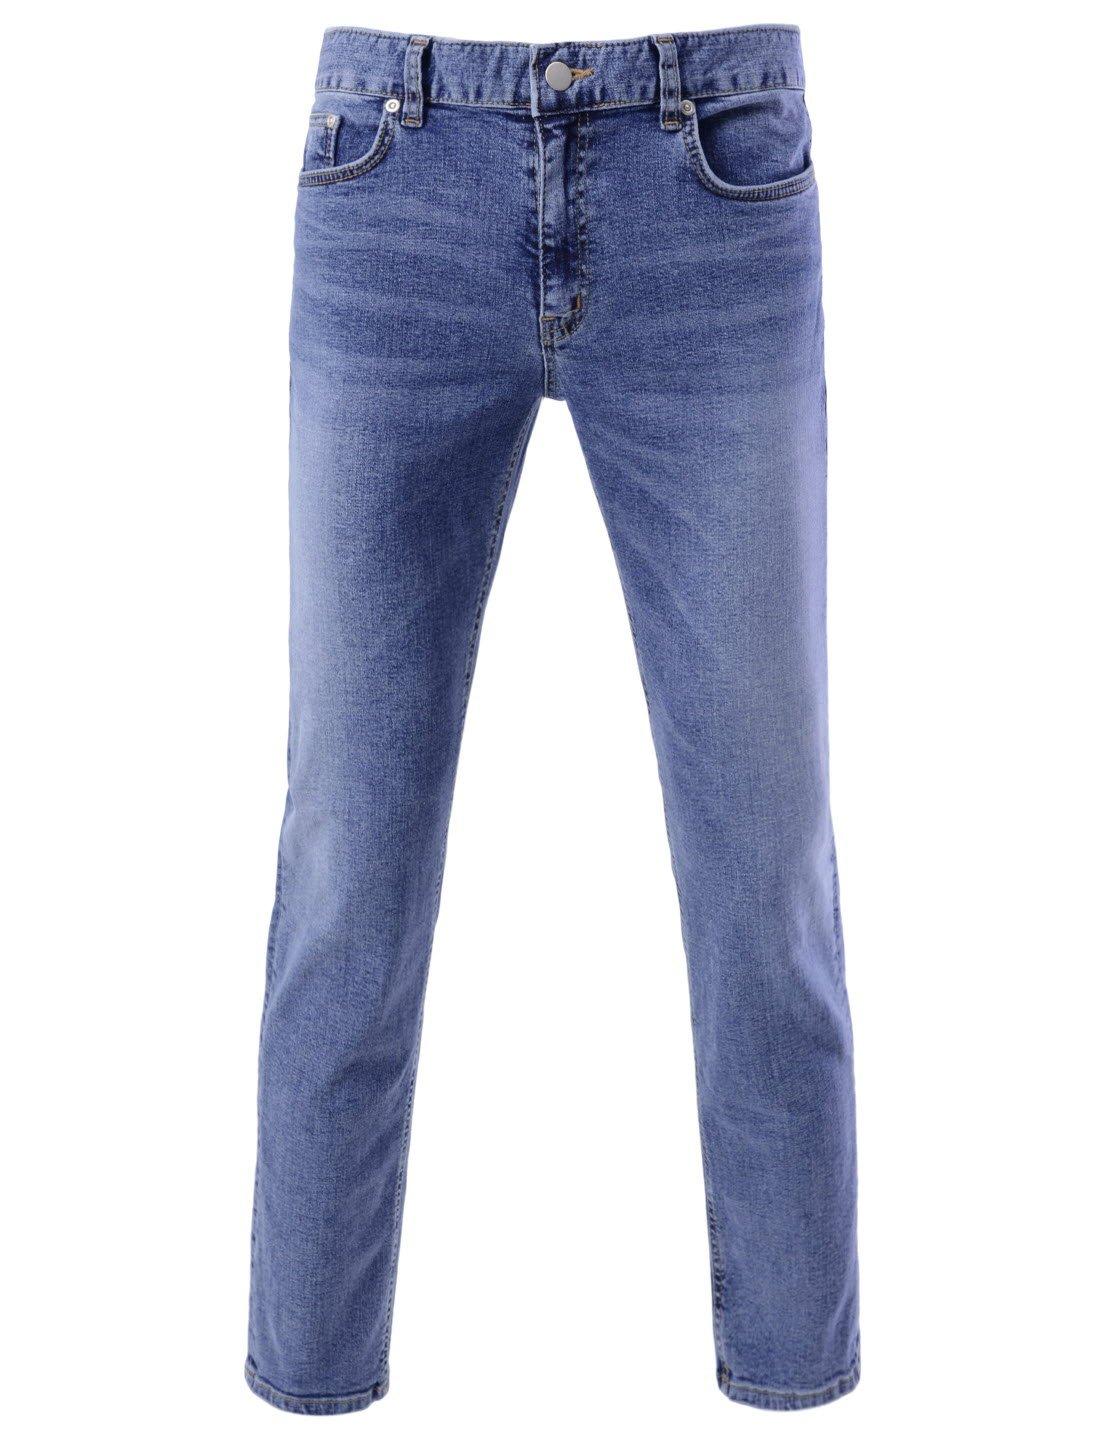 DETYLISH SJ2018 Mens Slim Fit Basic Denim Pants Comfy Stretchy Washing Jeans Blue 29W/27L(Tag Size M)